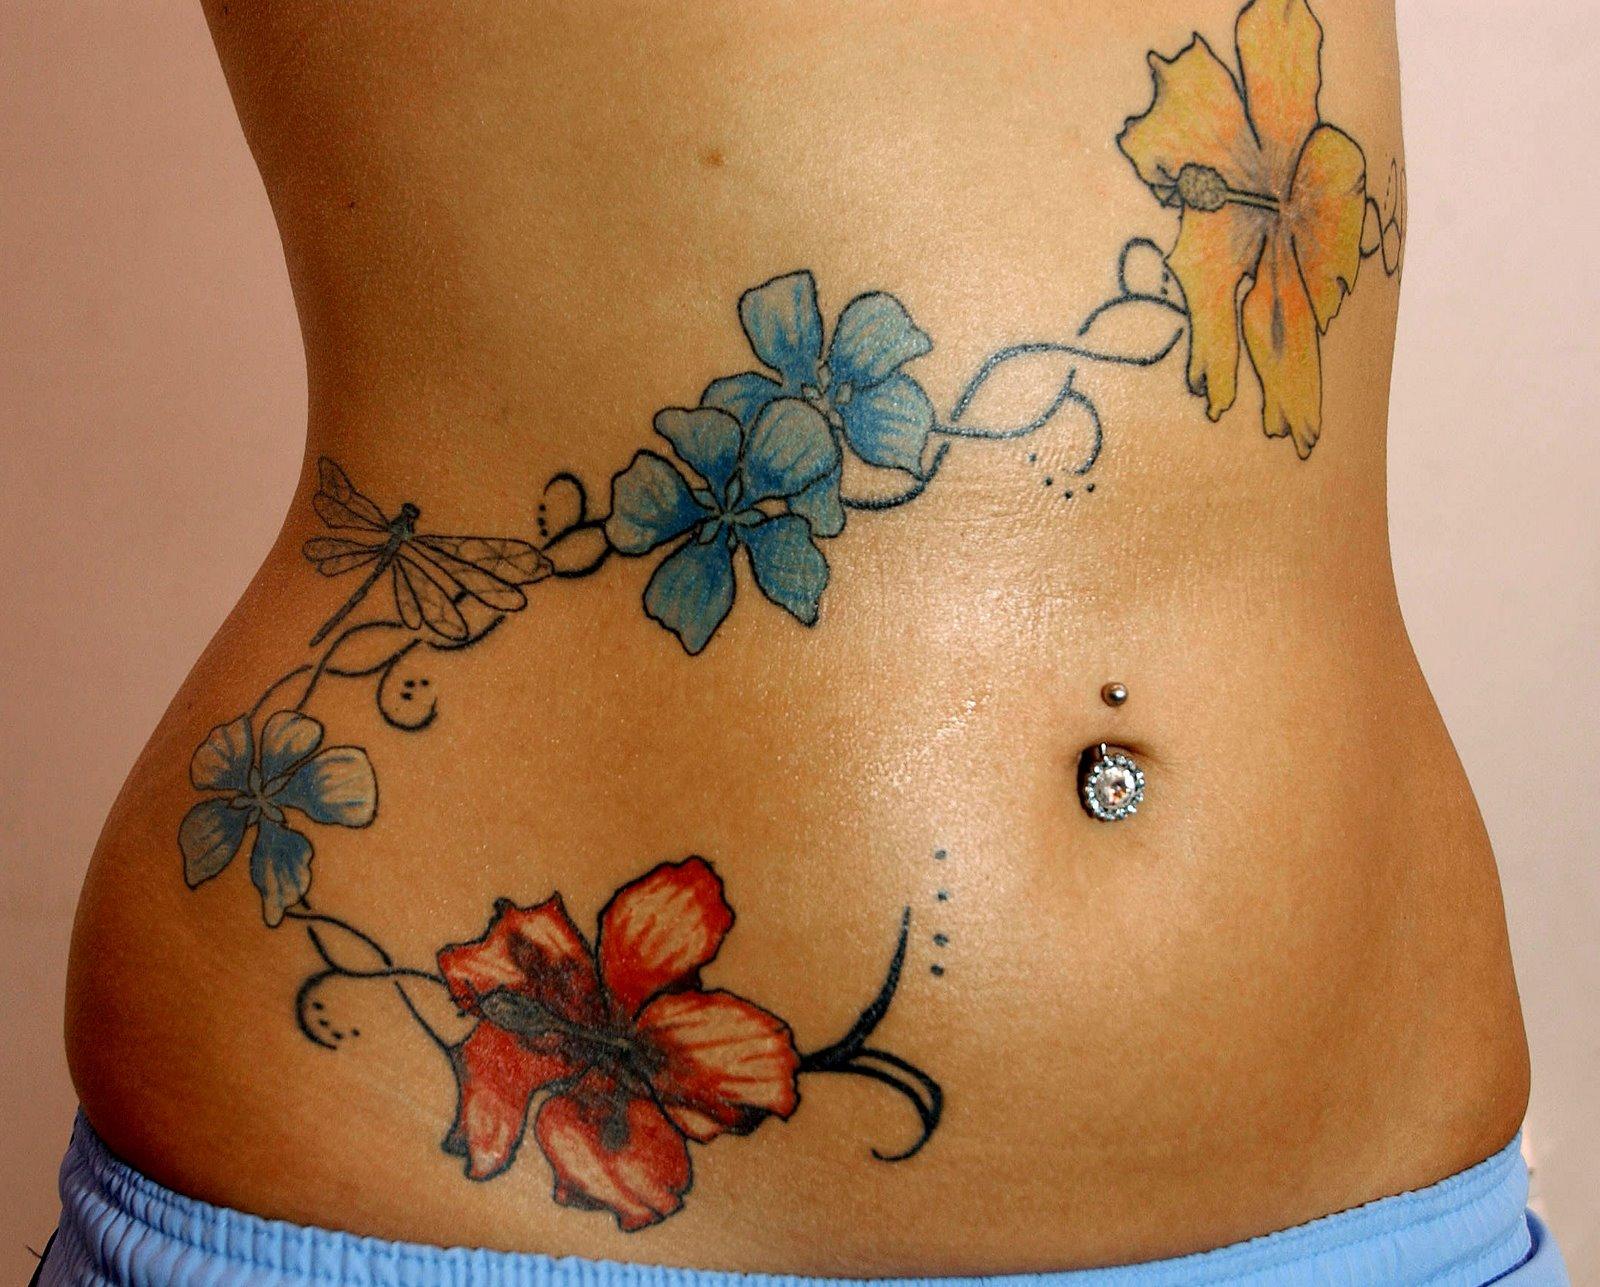 http://2.bp.blogspot.com/_35vorrBNyP0/TNMe6lLSvKI/AAAAAAAAB-E/YWcji3Isi28/s1600/Flower+Tattoo+Ideas+6.jpg